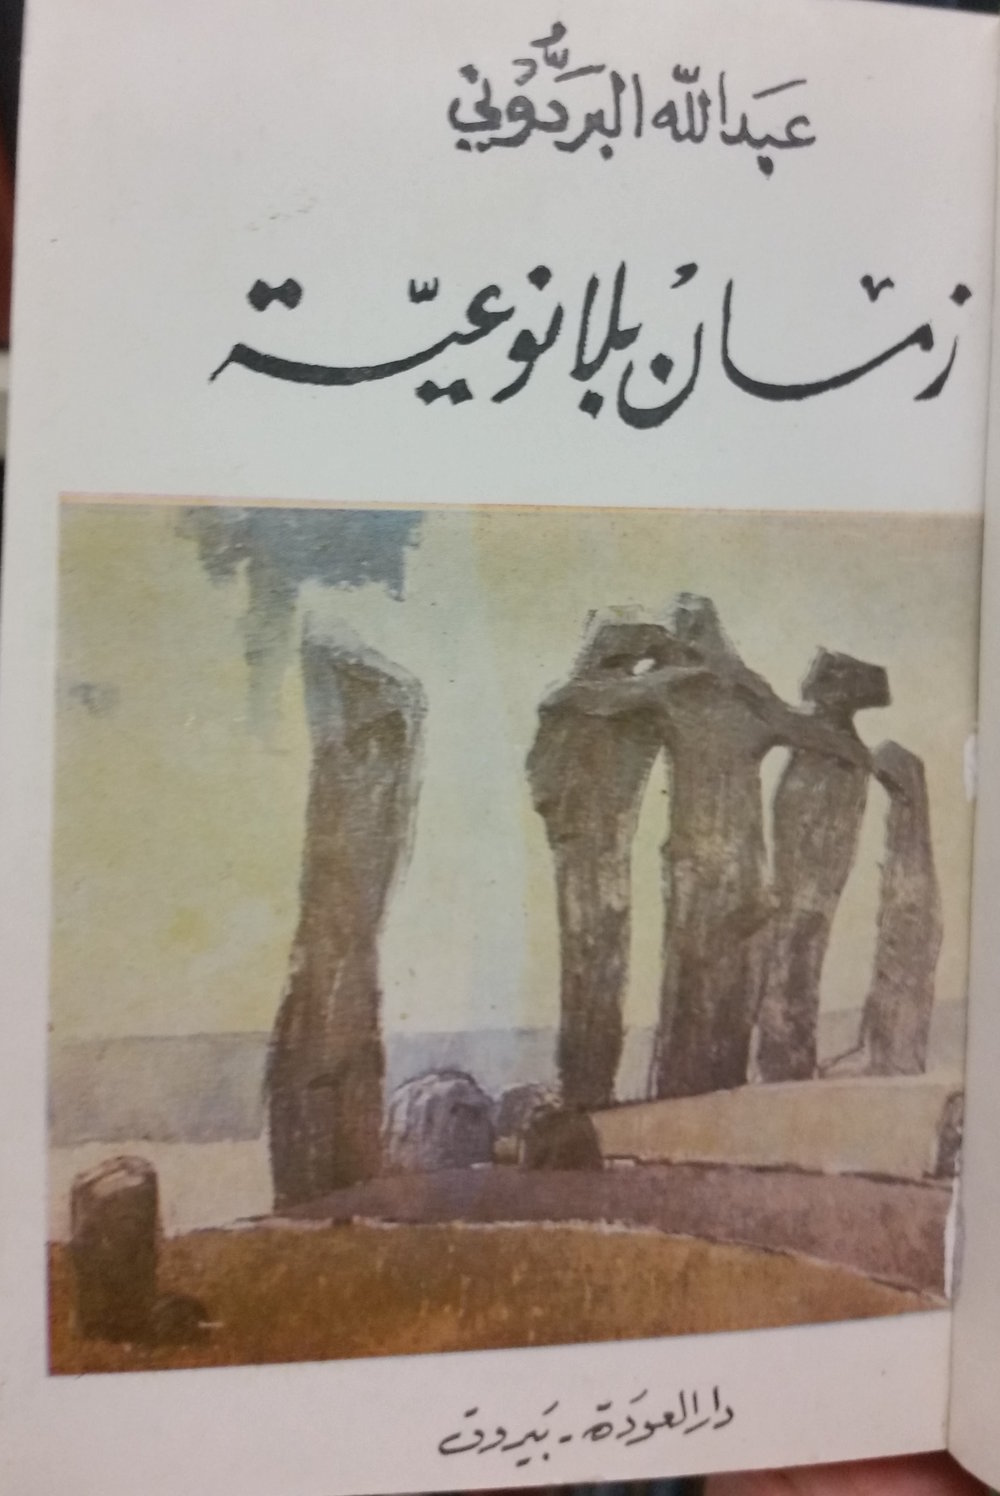 ʻAbd Allāh al-Bardūnī,Zamān bi-lā nawʻ̄ıyah: shiʻr(Bayrūt : Dār al-ʻAwdah, 1980)